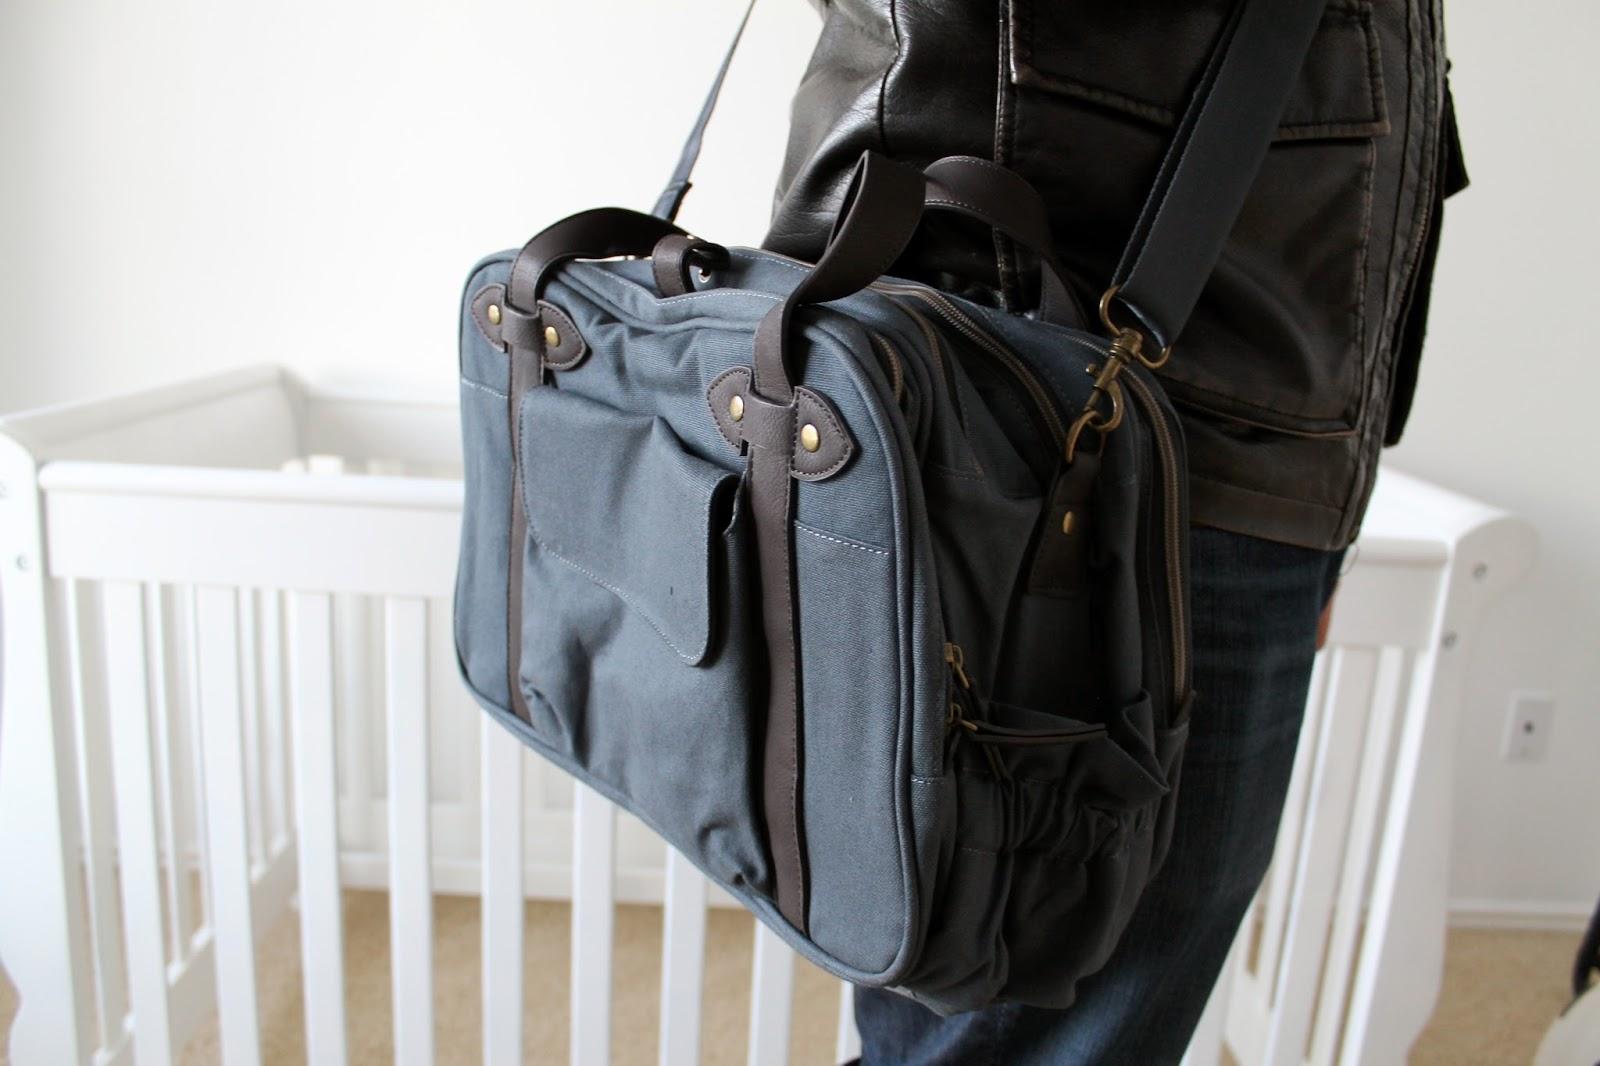 the best diaper lifestyle bag ever giveaway chris. Black Bedroom Furniture Sets. Home Design Ideas